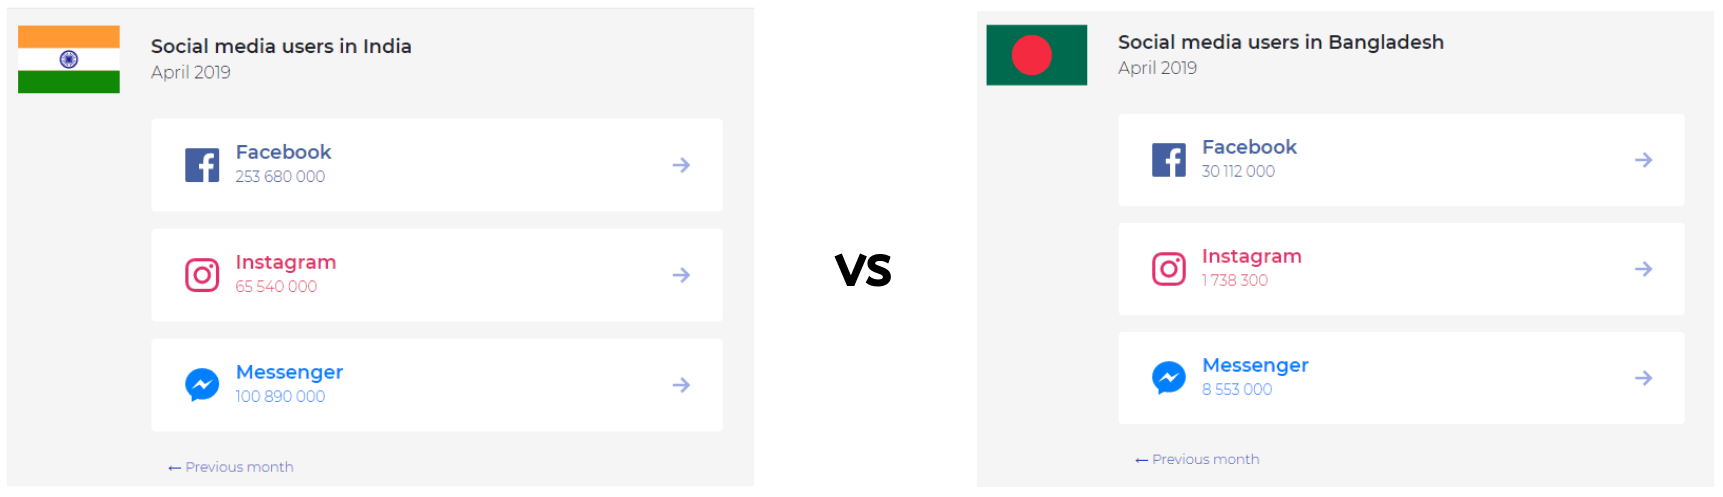 India vs Bangladesh social media